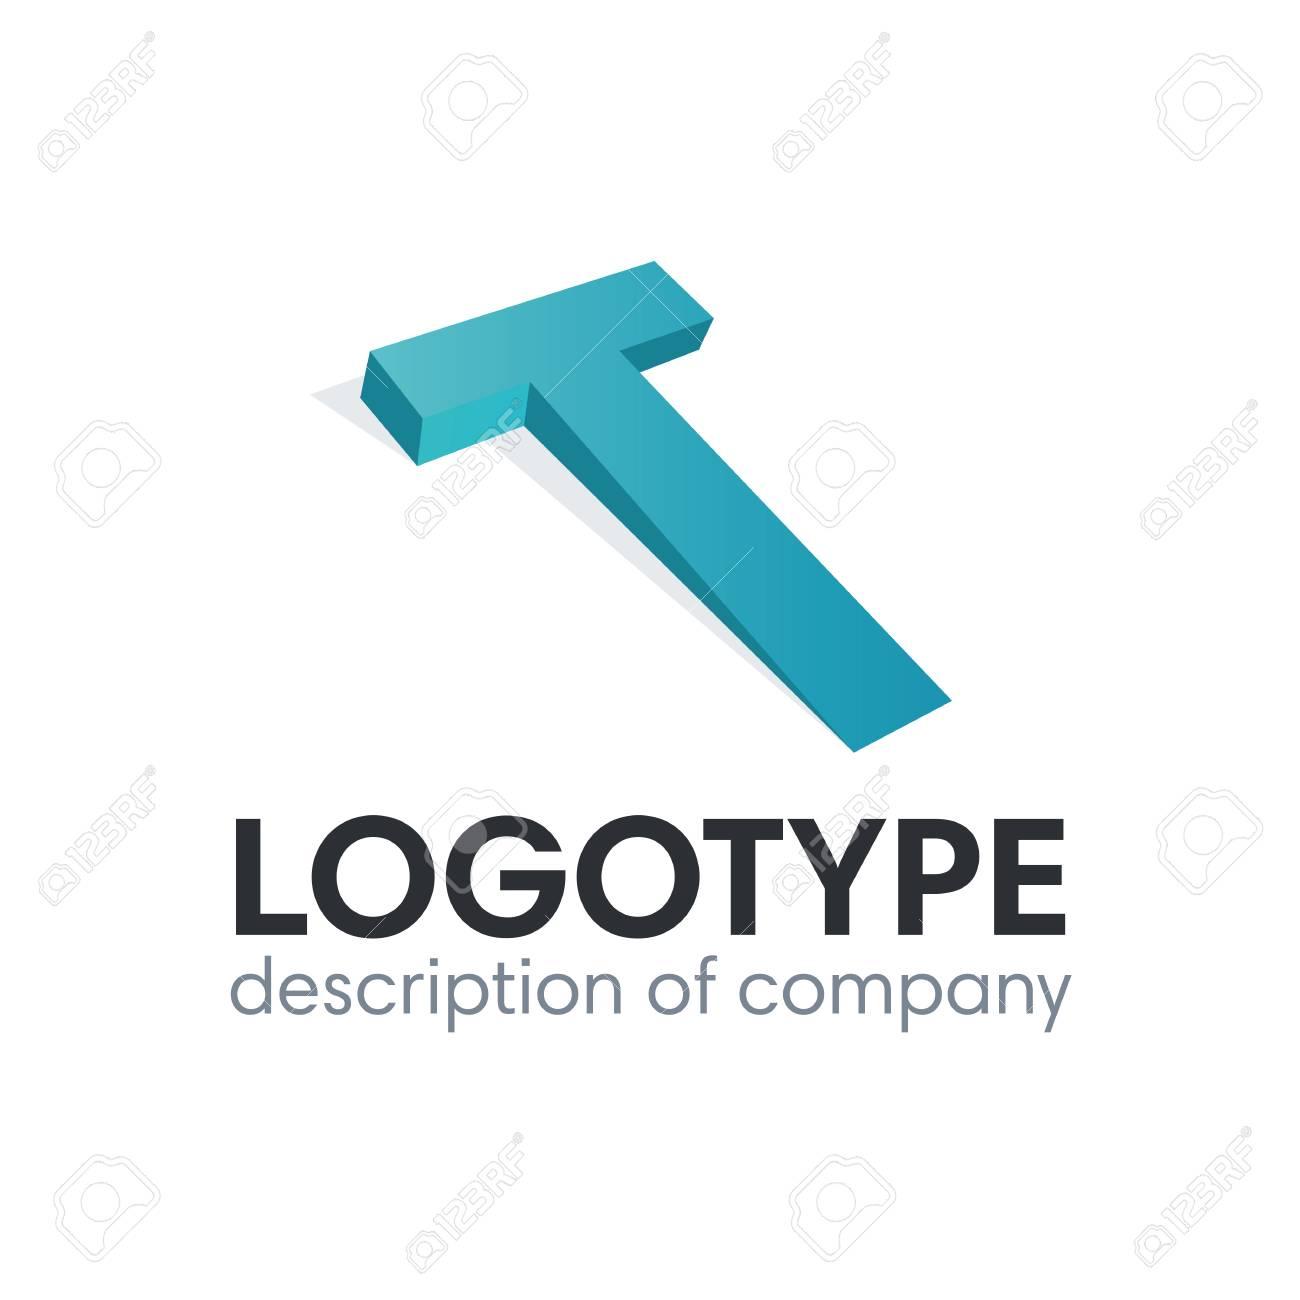 Letter T logo icon design template elements - 84049339